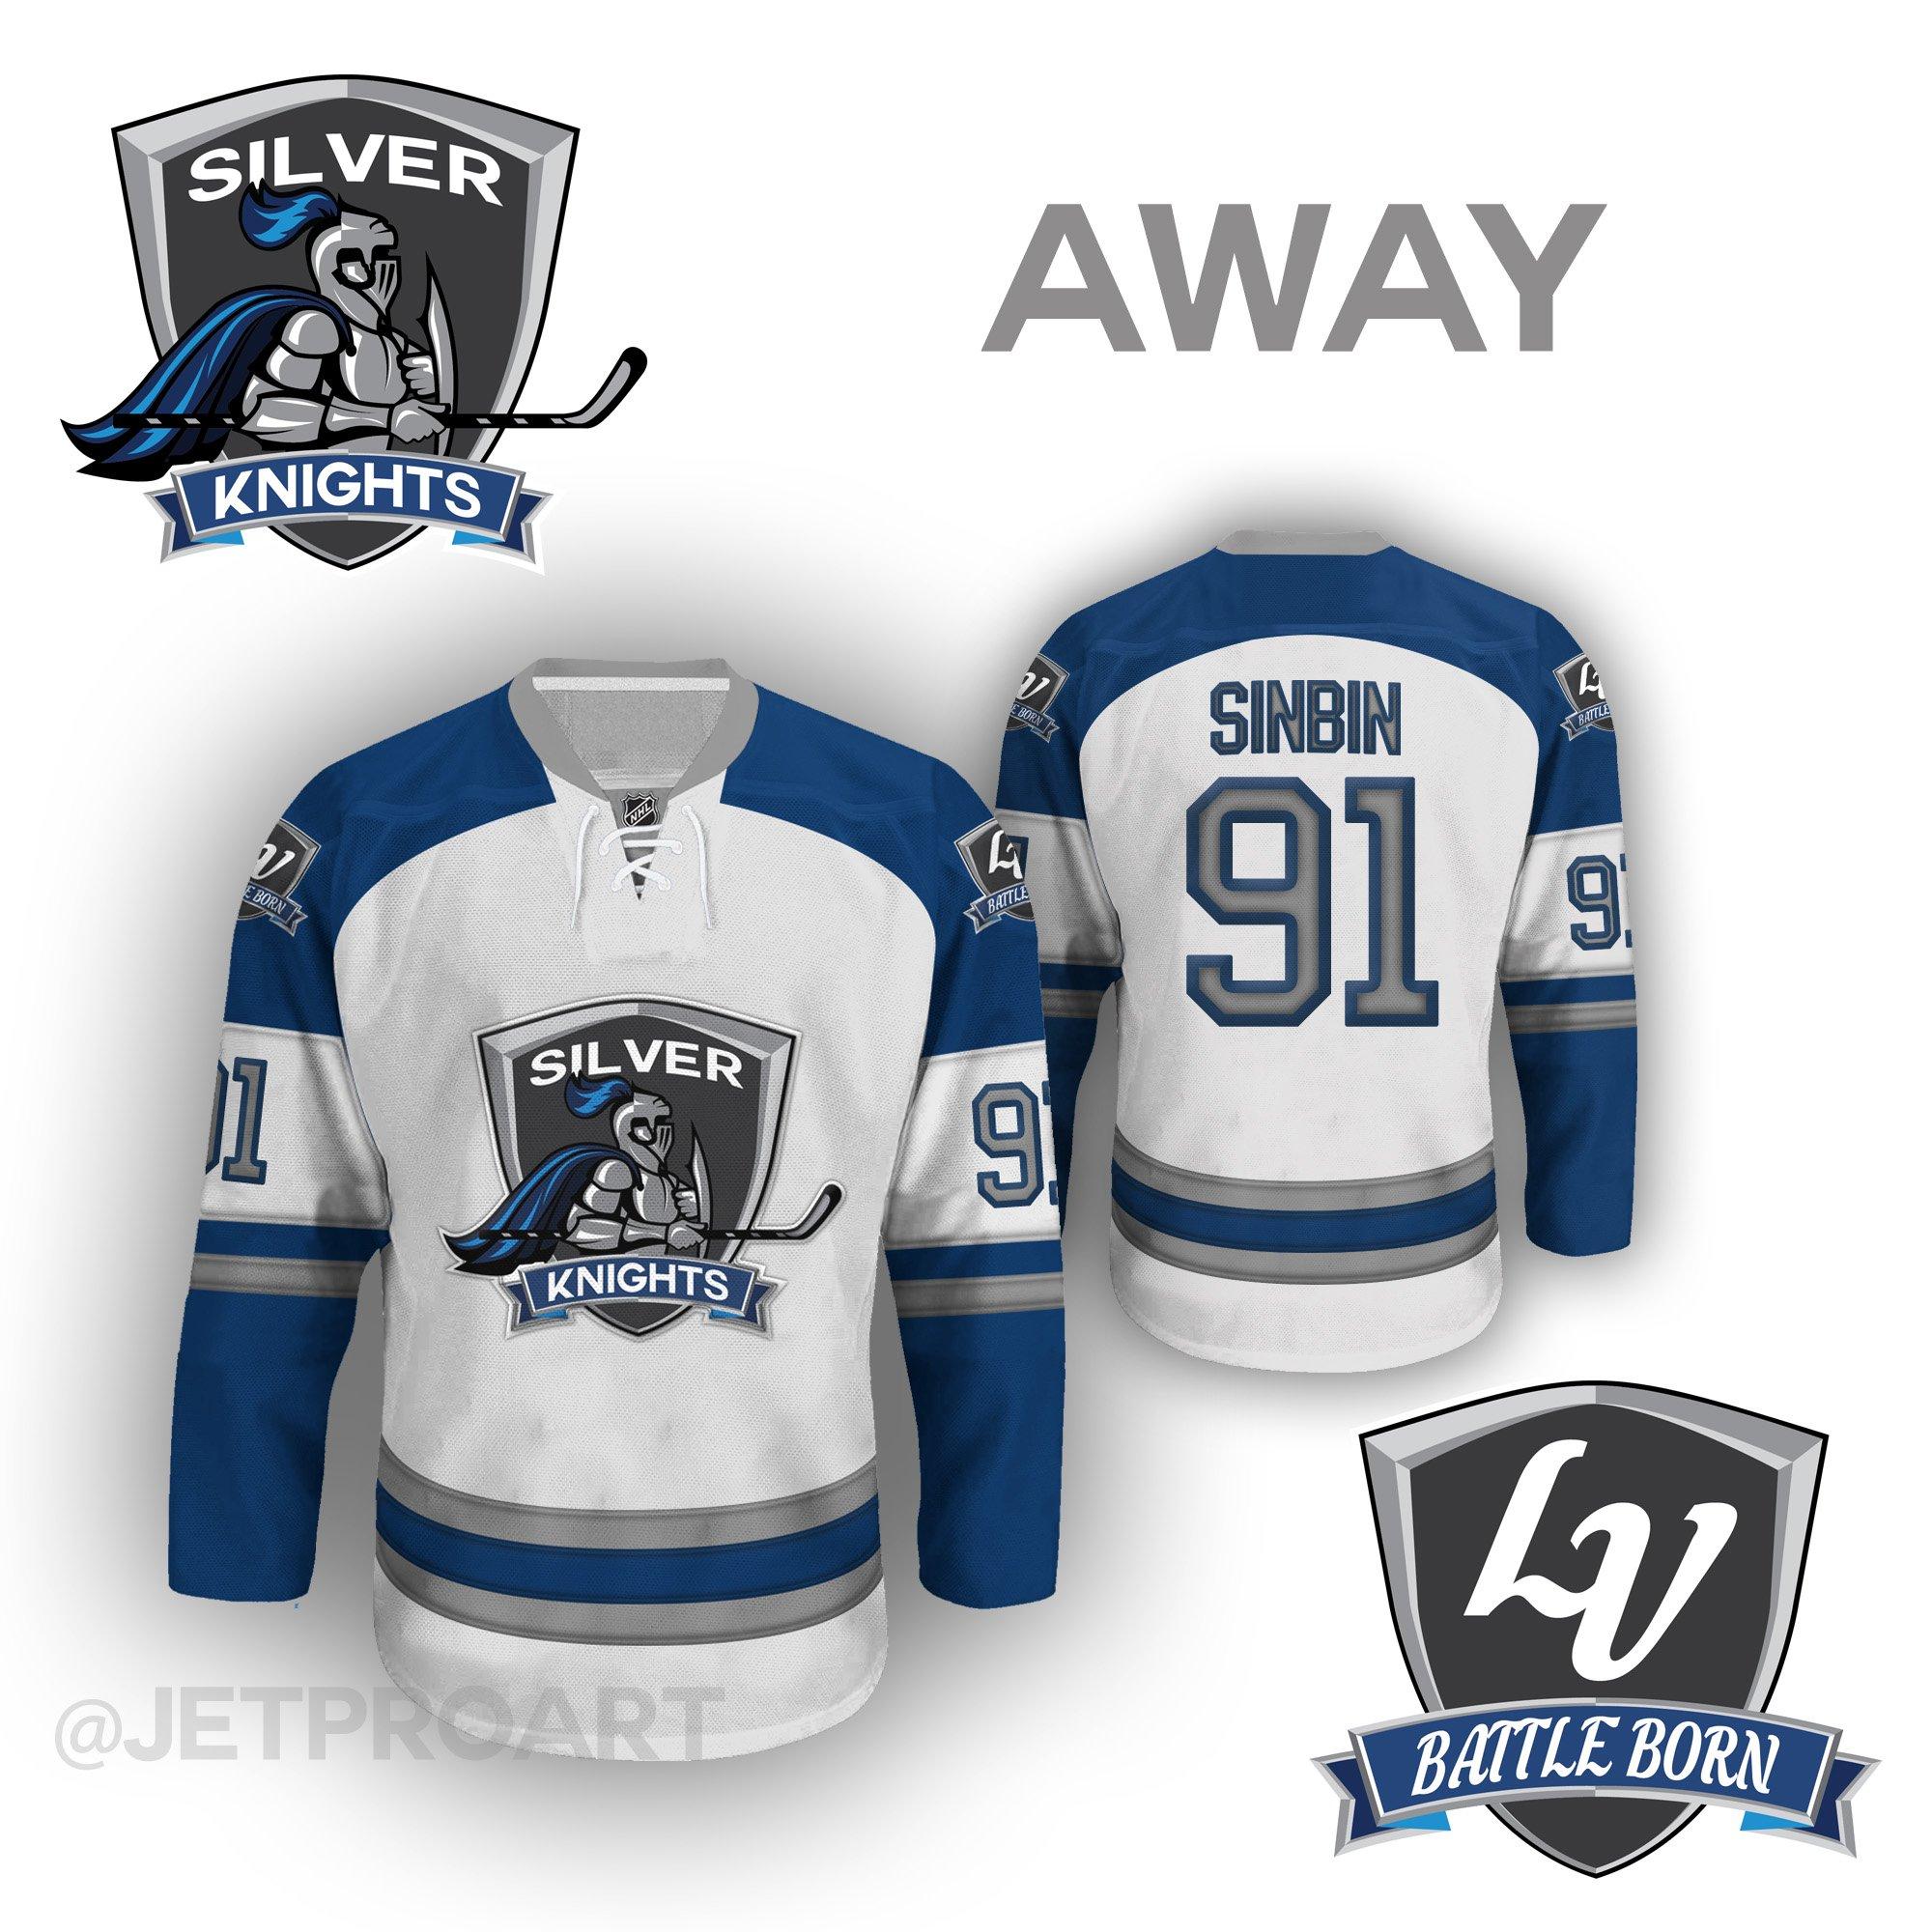 release date a5d68 9bde7 Las Vegas Silver Knights Jersey Concept - SinBin.vegas